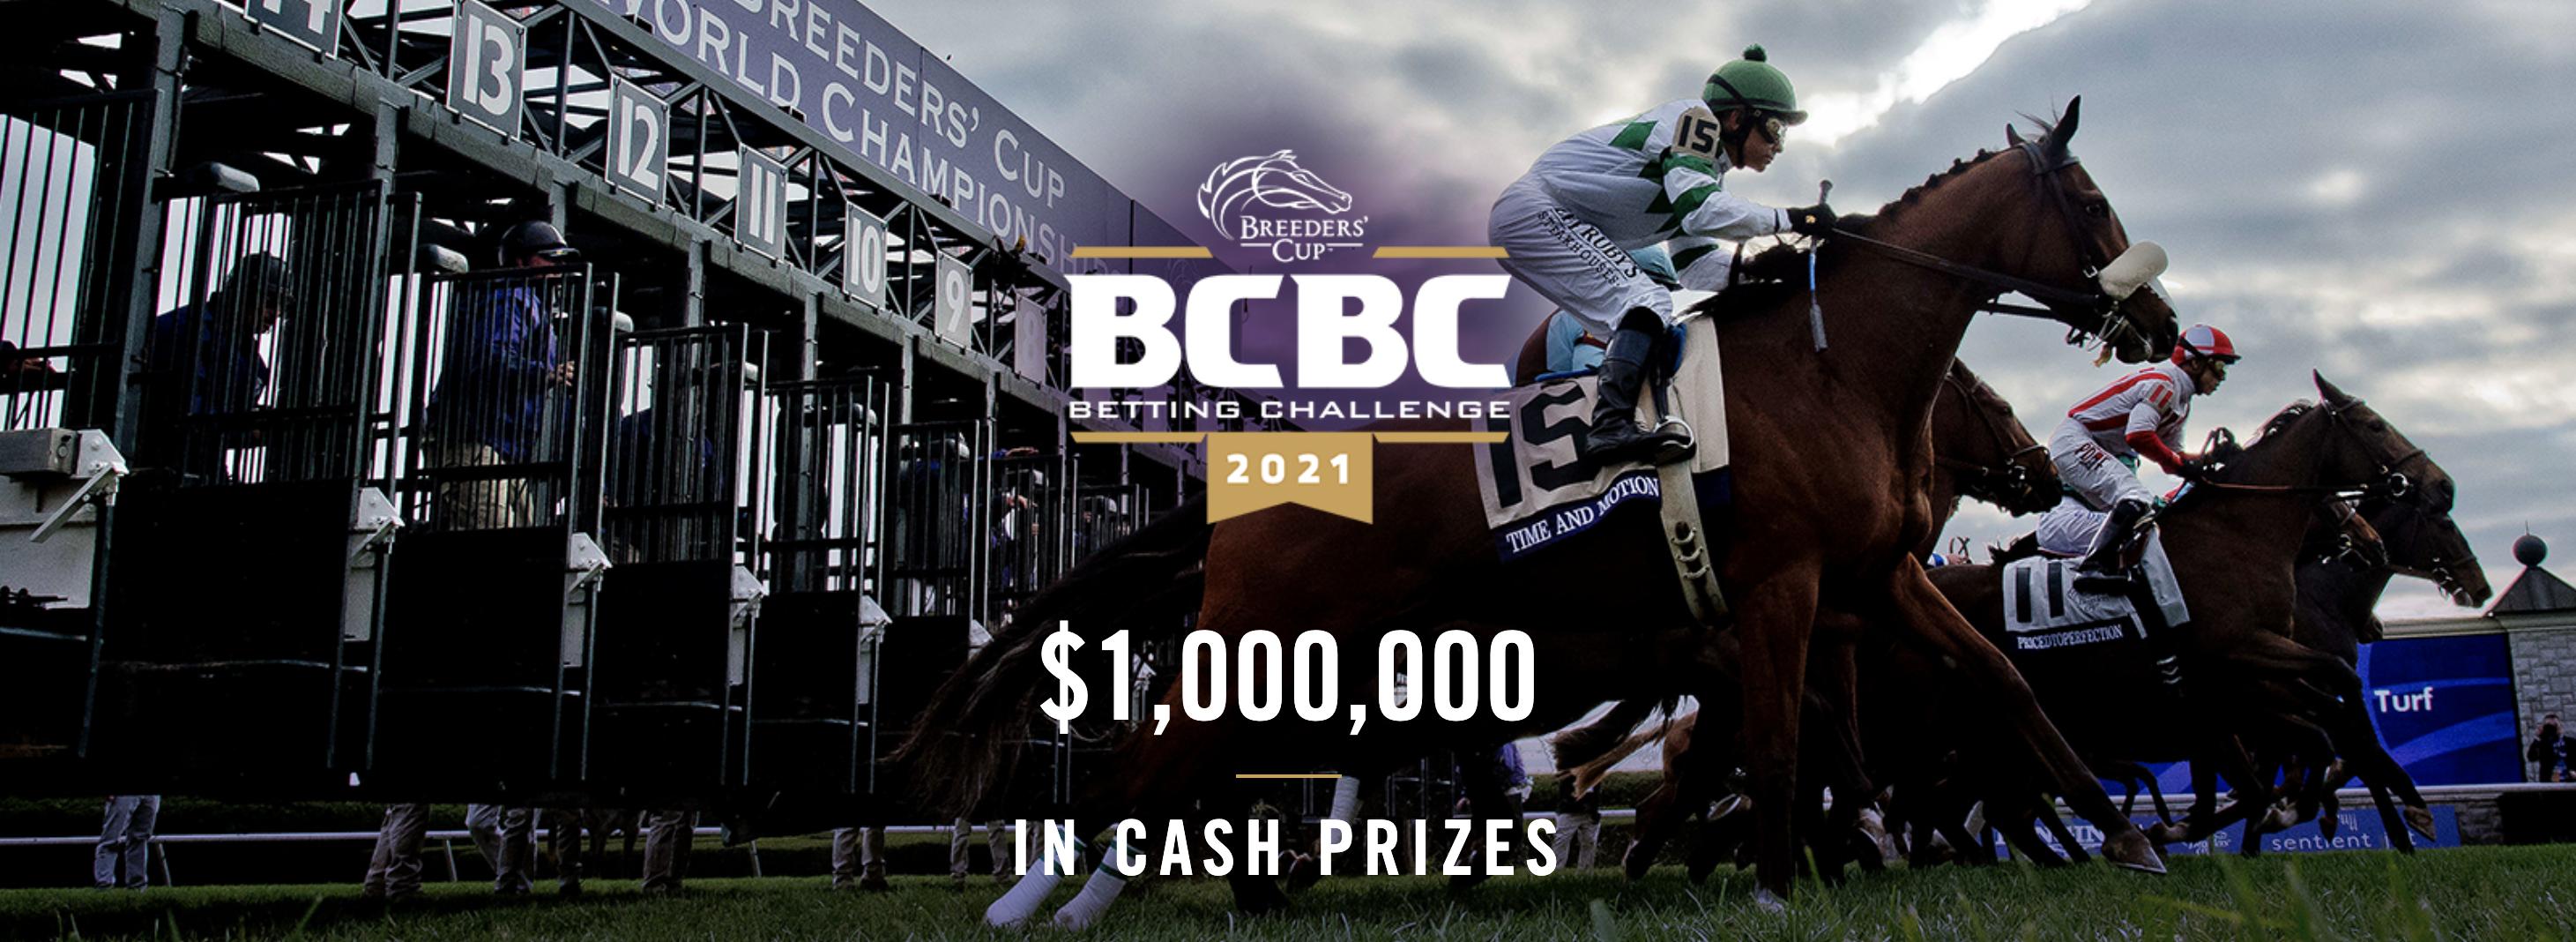 Breeders' Cup Betting Challenge